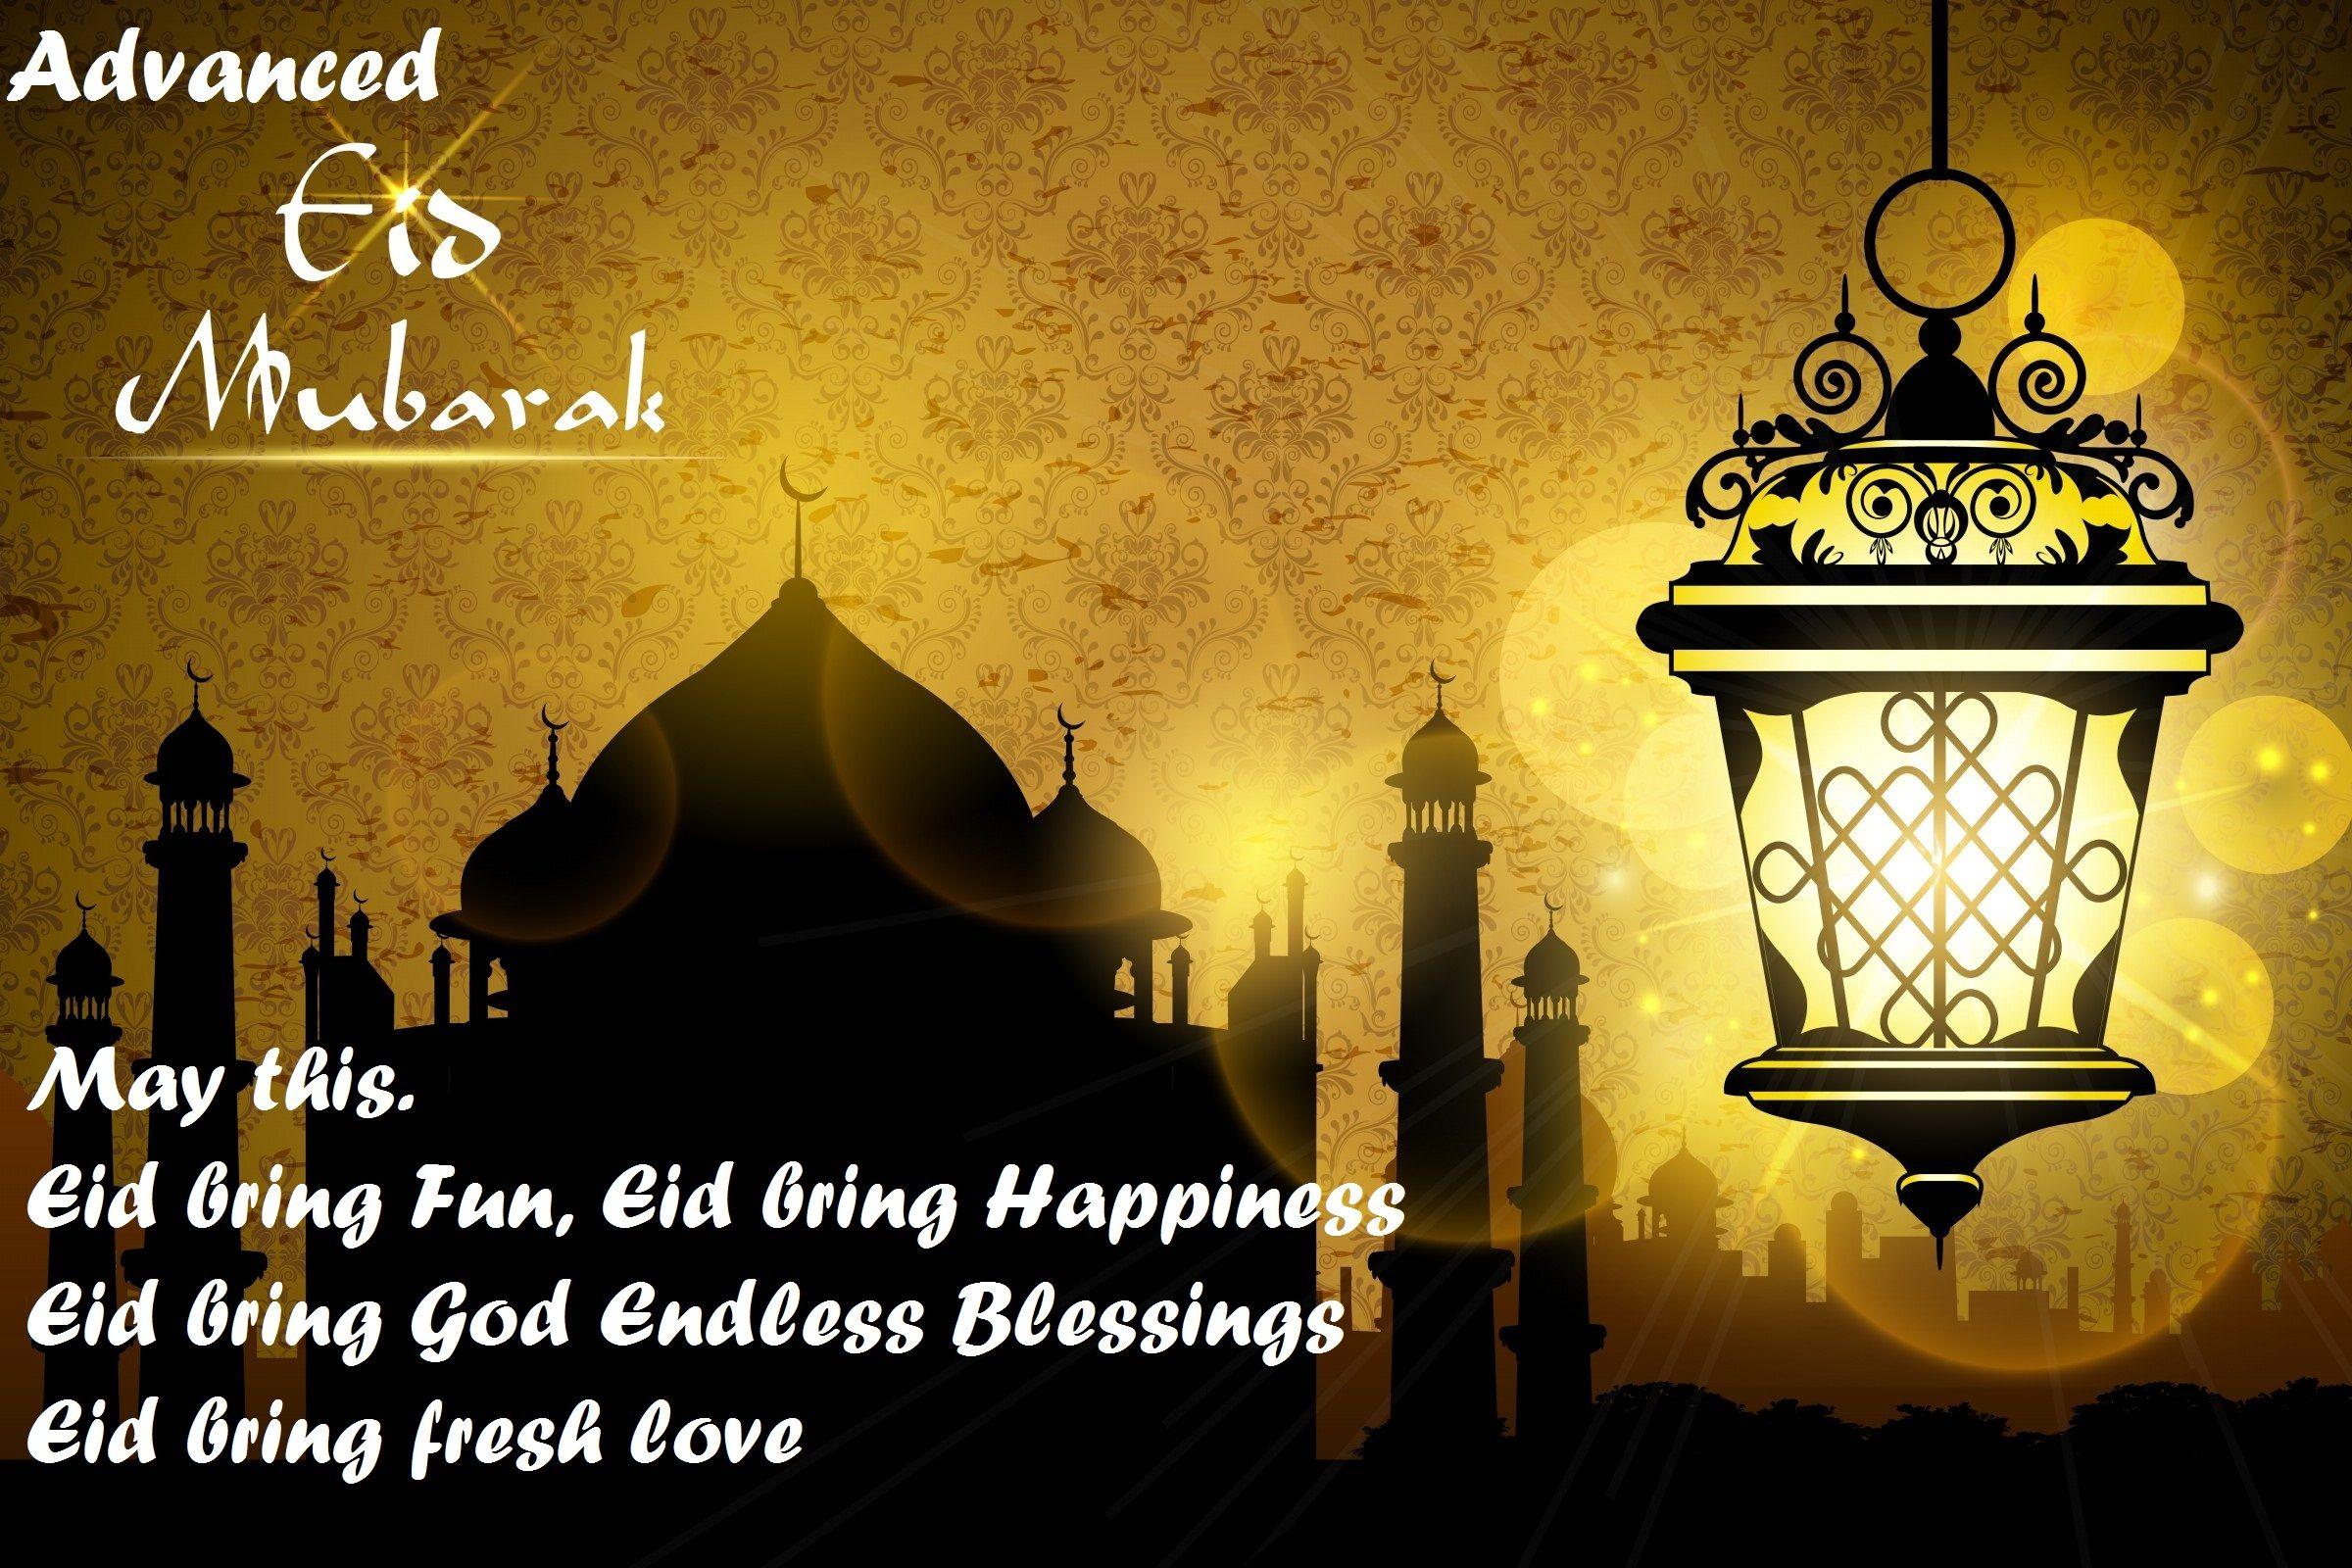 Advanced Eid Mubarak Wallaper 5 Eid Mubarak Greetings Eid Mubarak Wallpaper Eid Mubarak Images